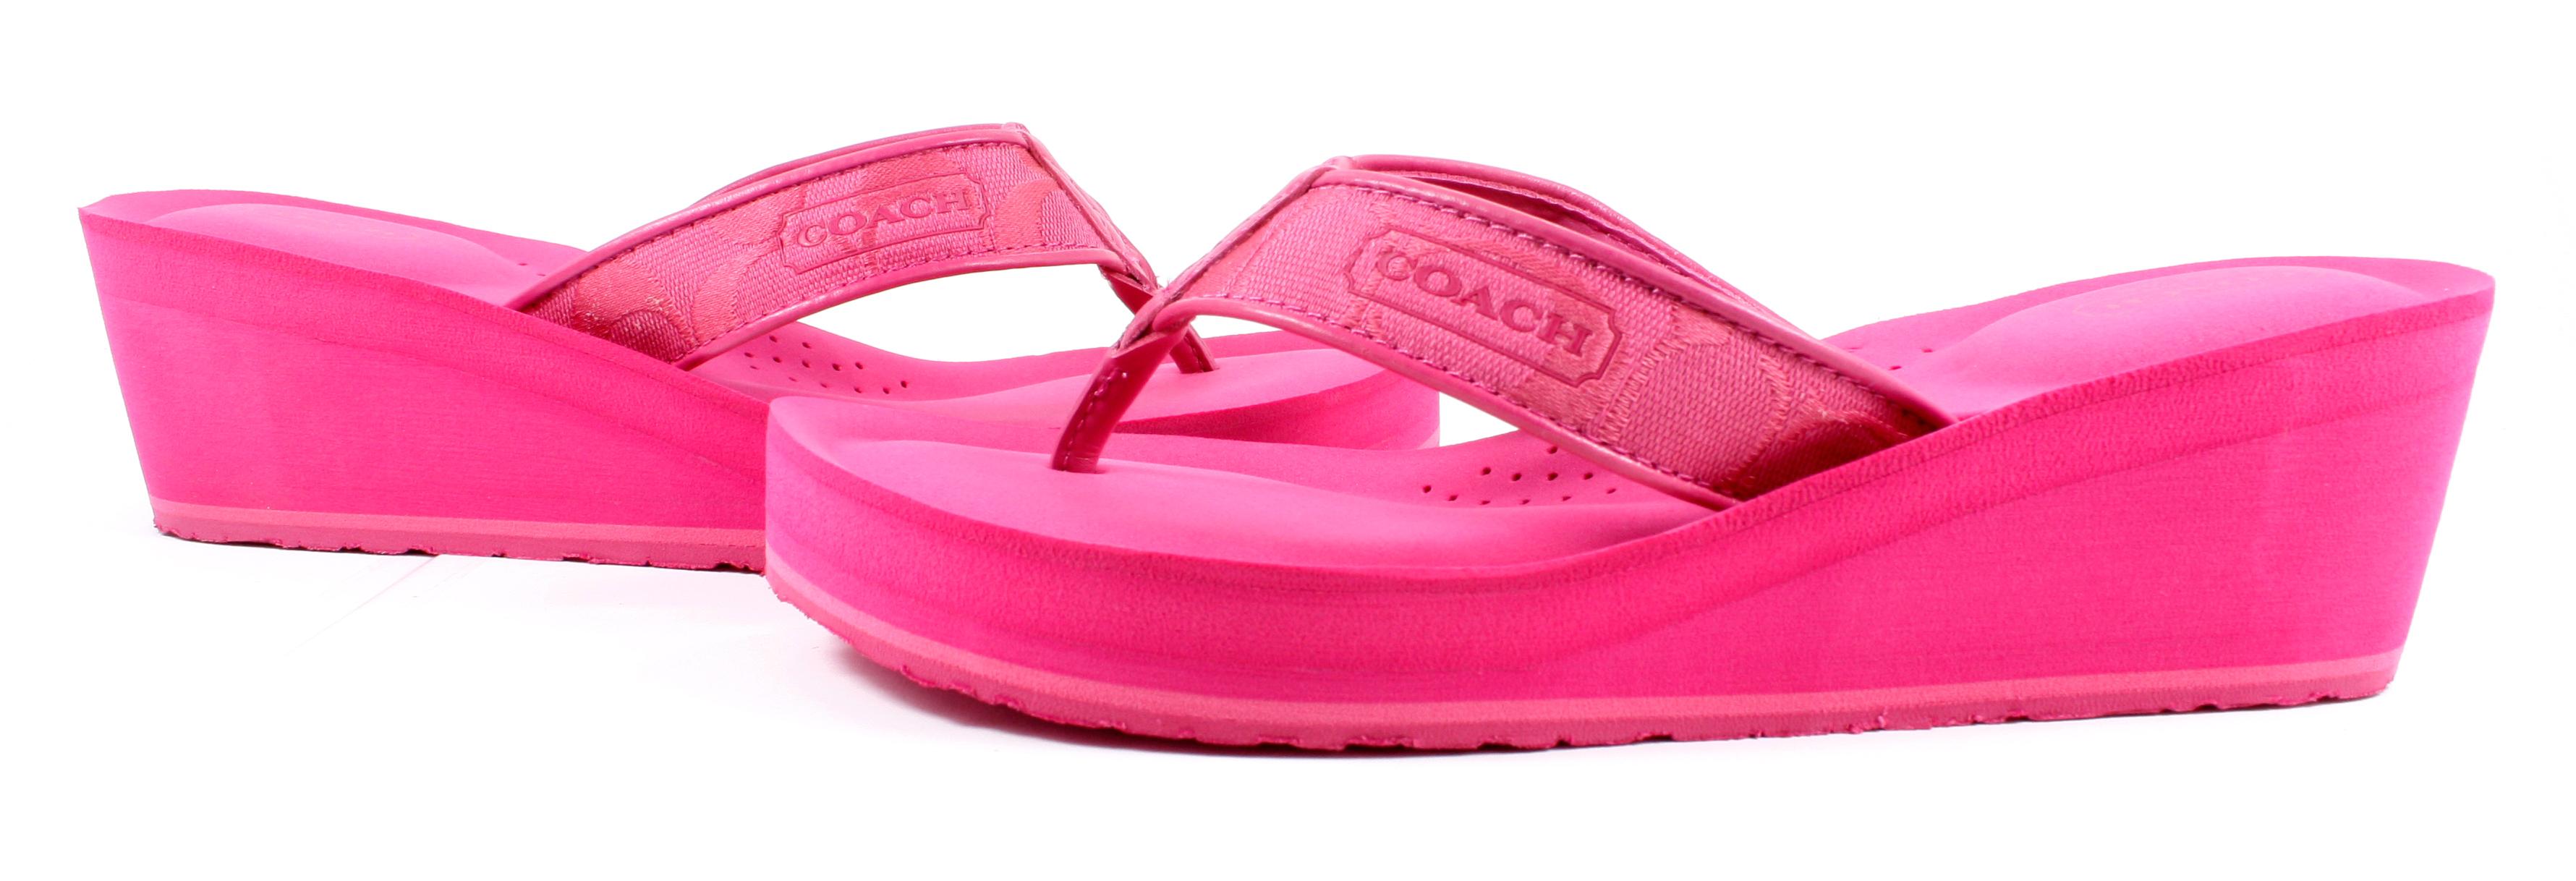 Coach Signature Jaicee Wedge Sandals Flip Flops Shoes